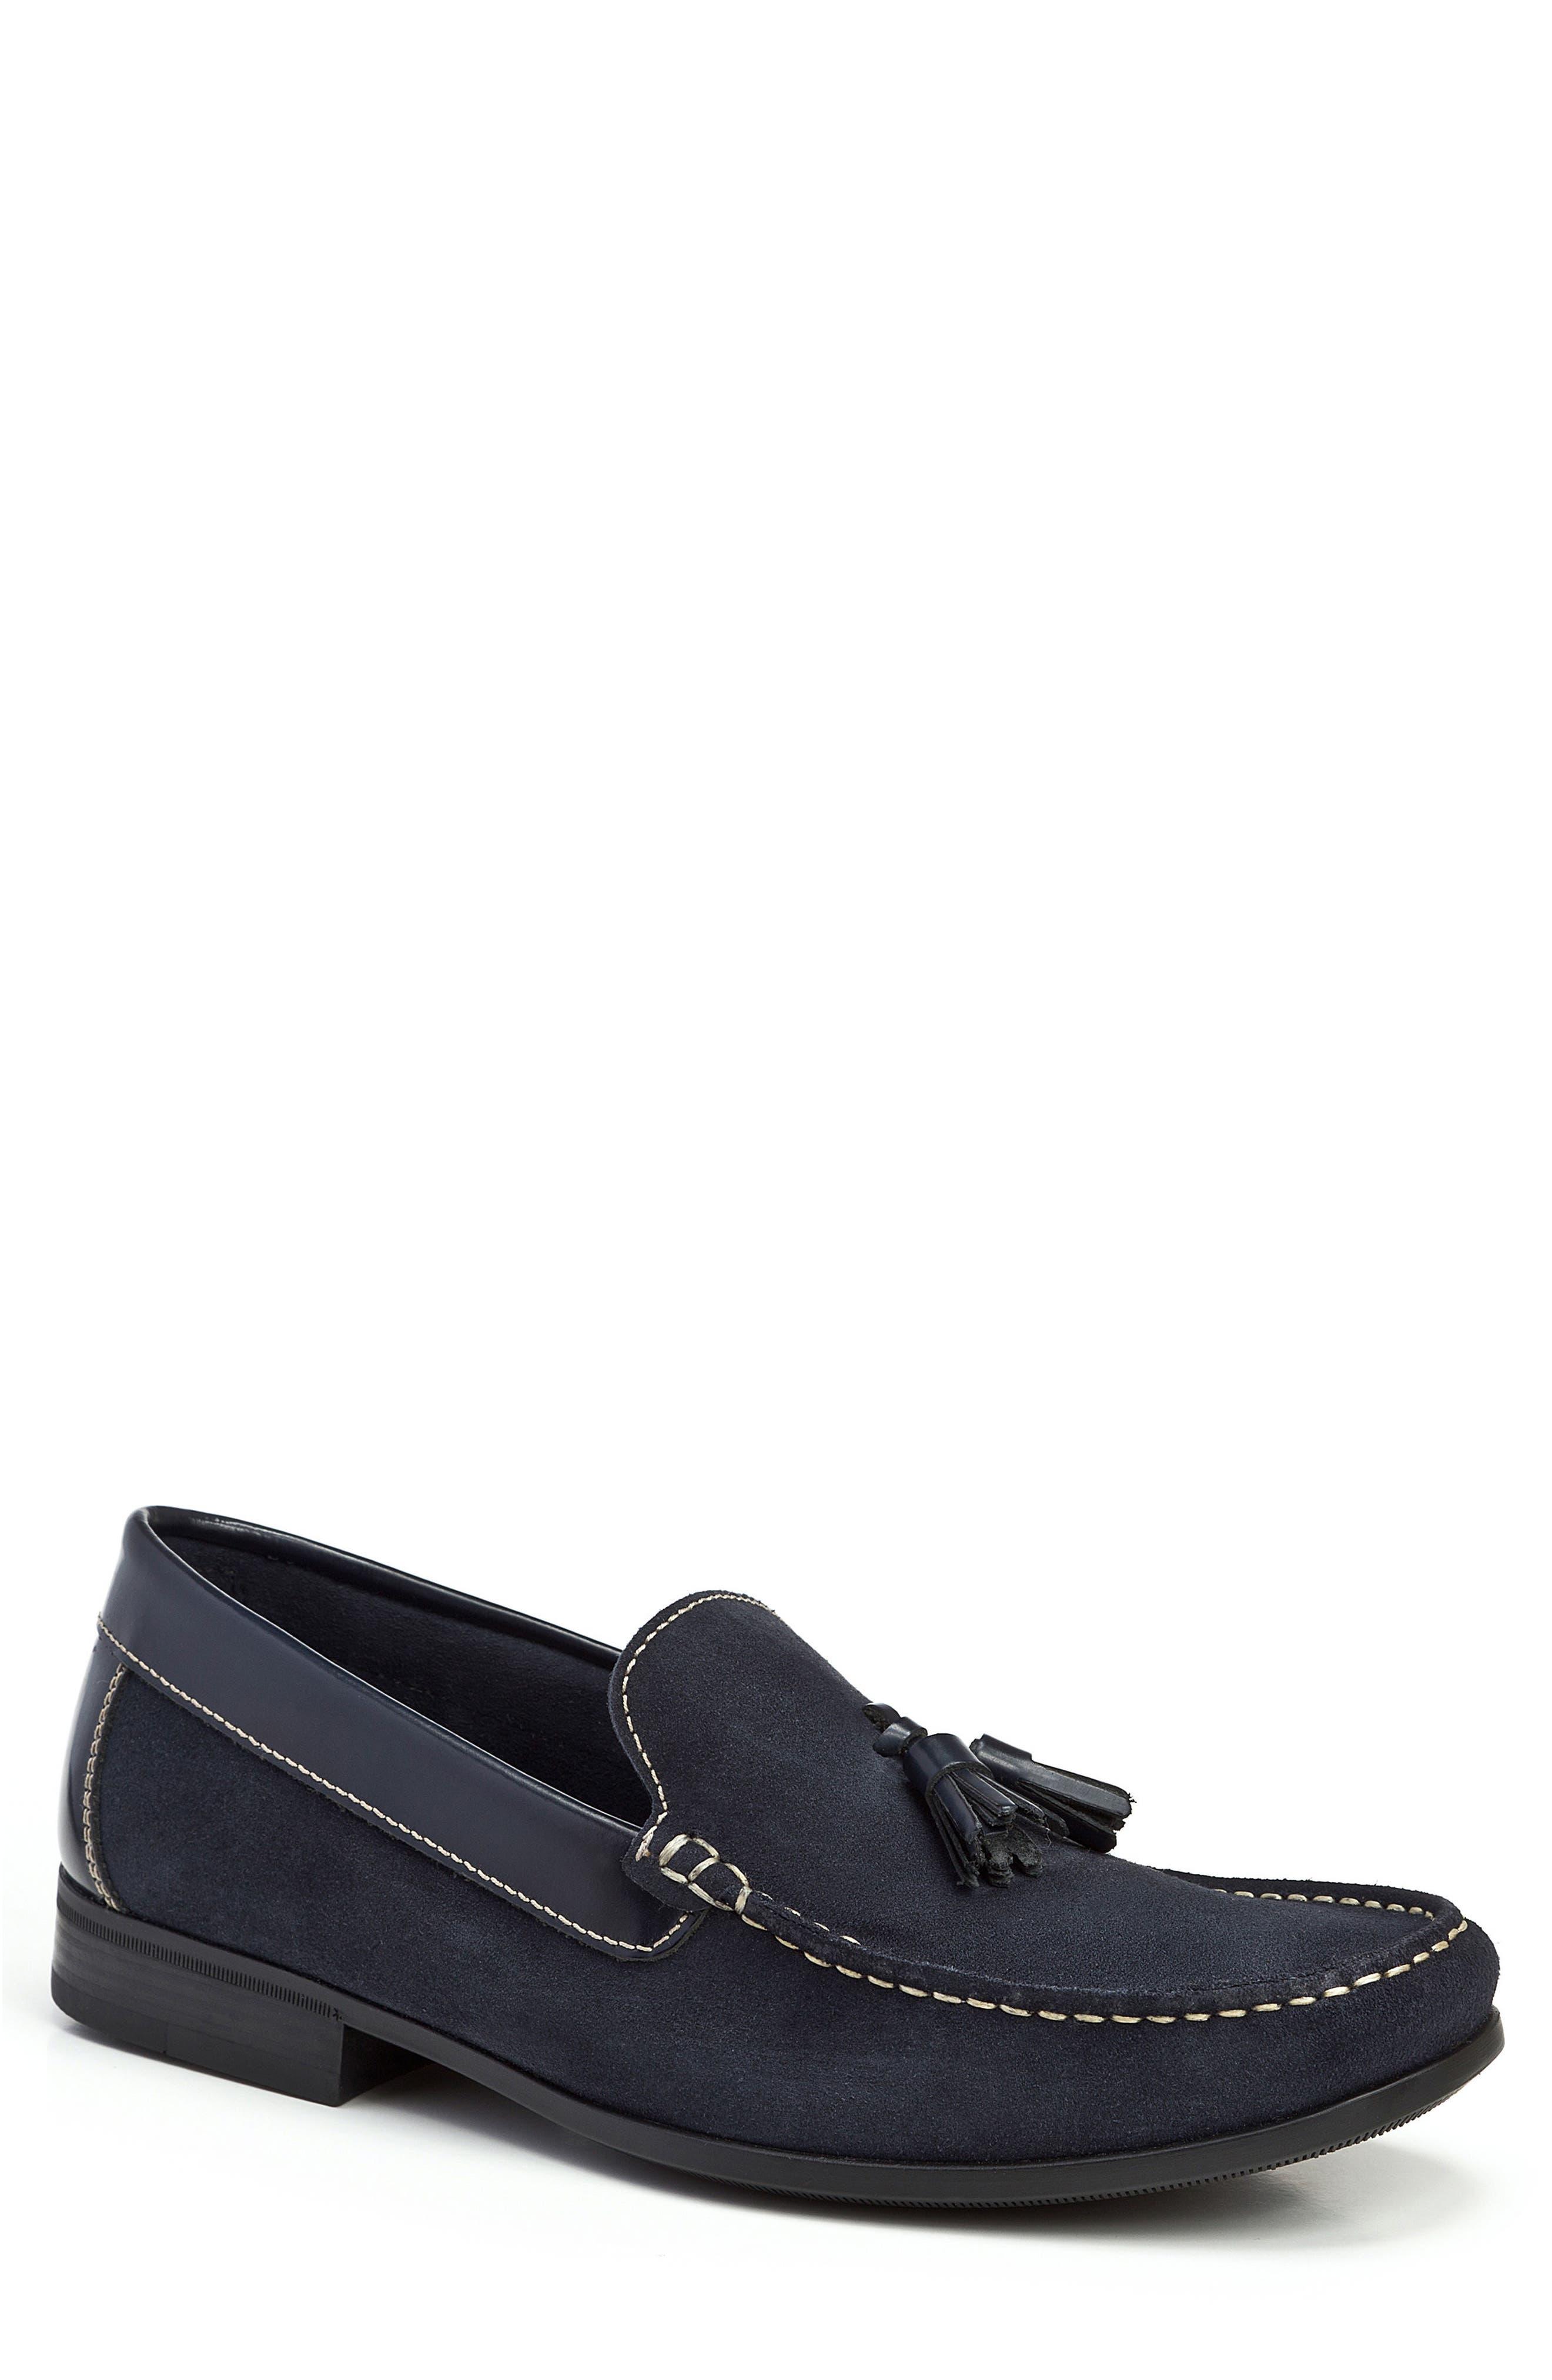 Hojas Tassel Loafer,                         Main,                         color, Navy Leather